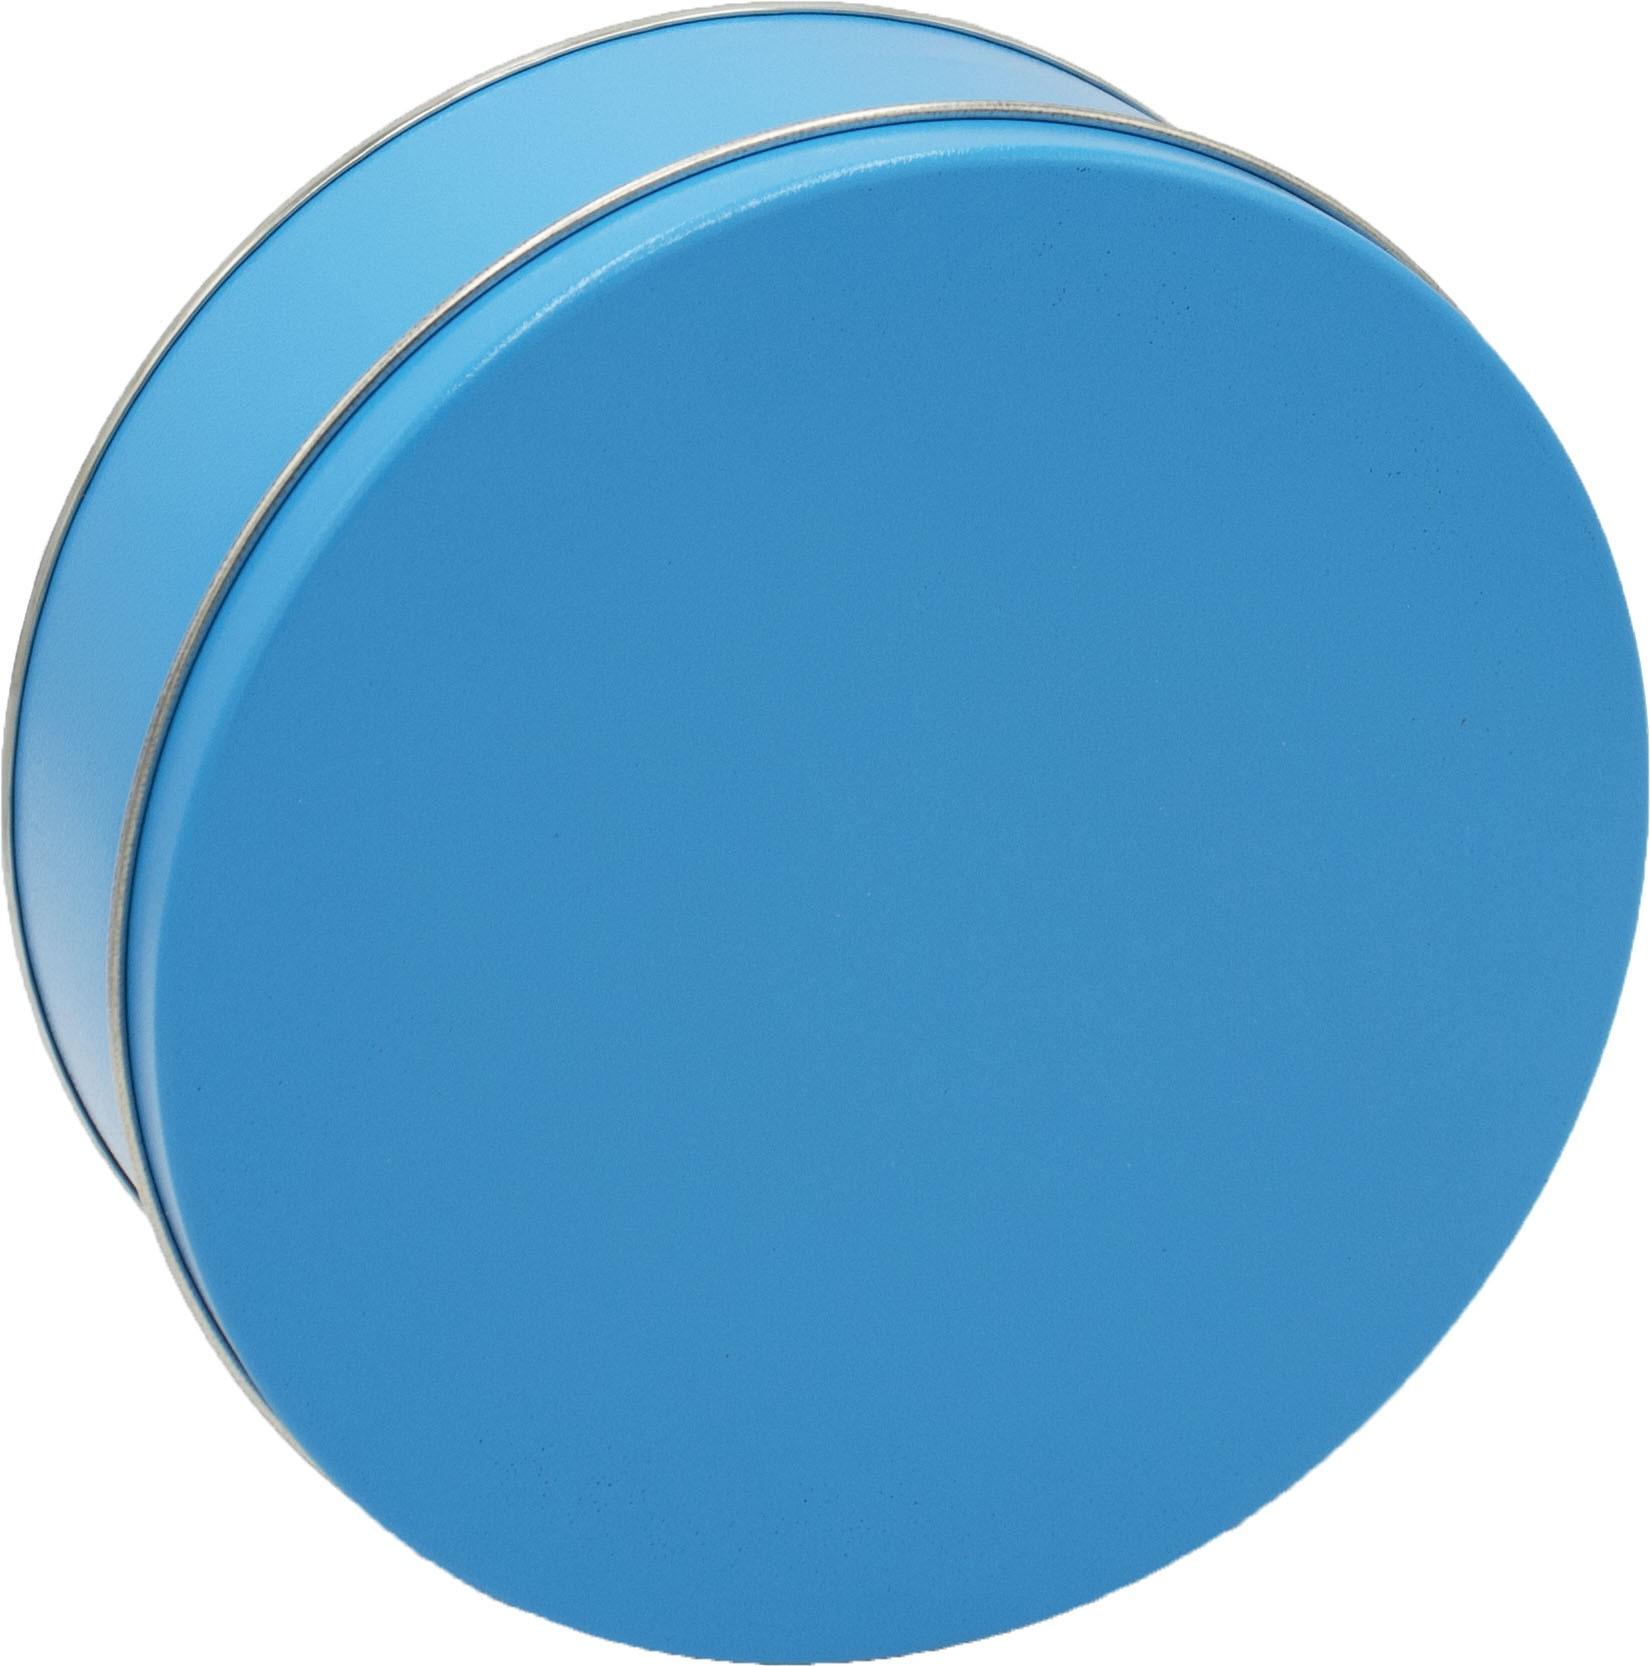 2C Bright Blue